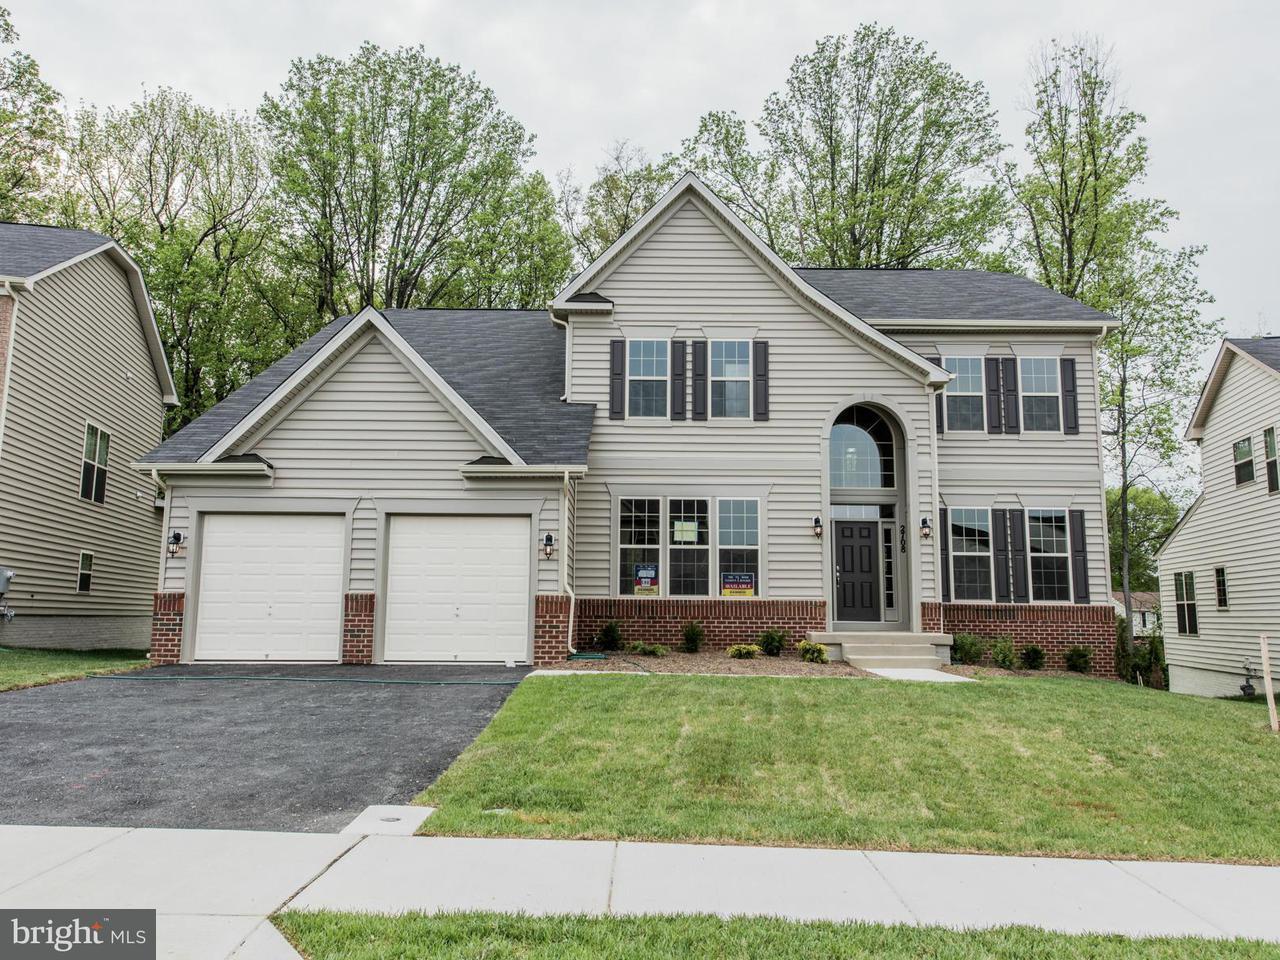 Single Family Home for Sale at 2705 TROTTER PARK Lane 2705 TROTTER PARK Lane Glenarden, Maryland 20706 United States